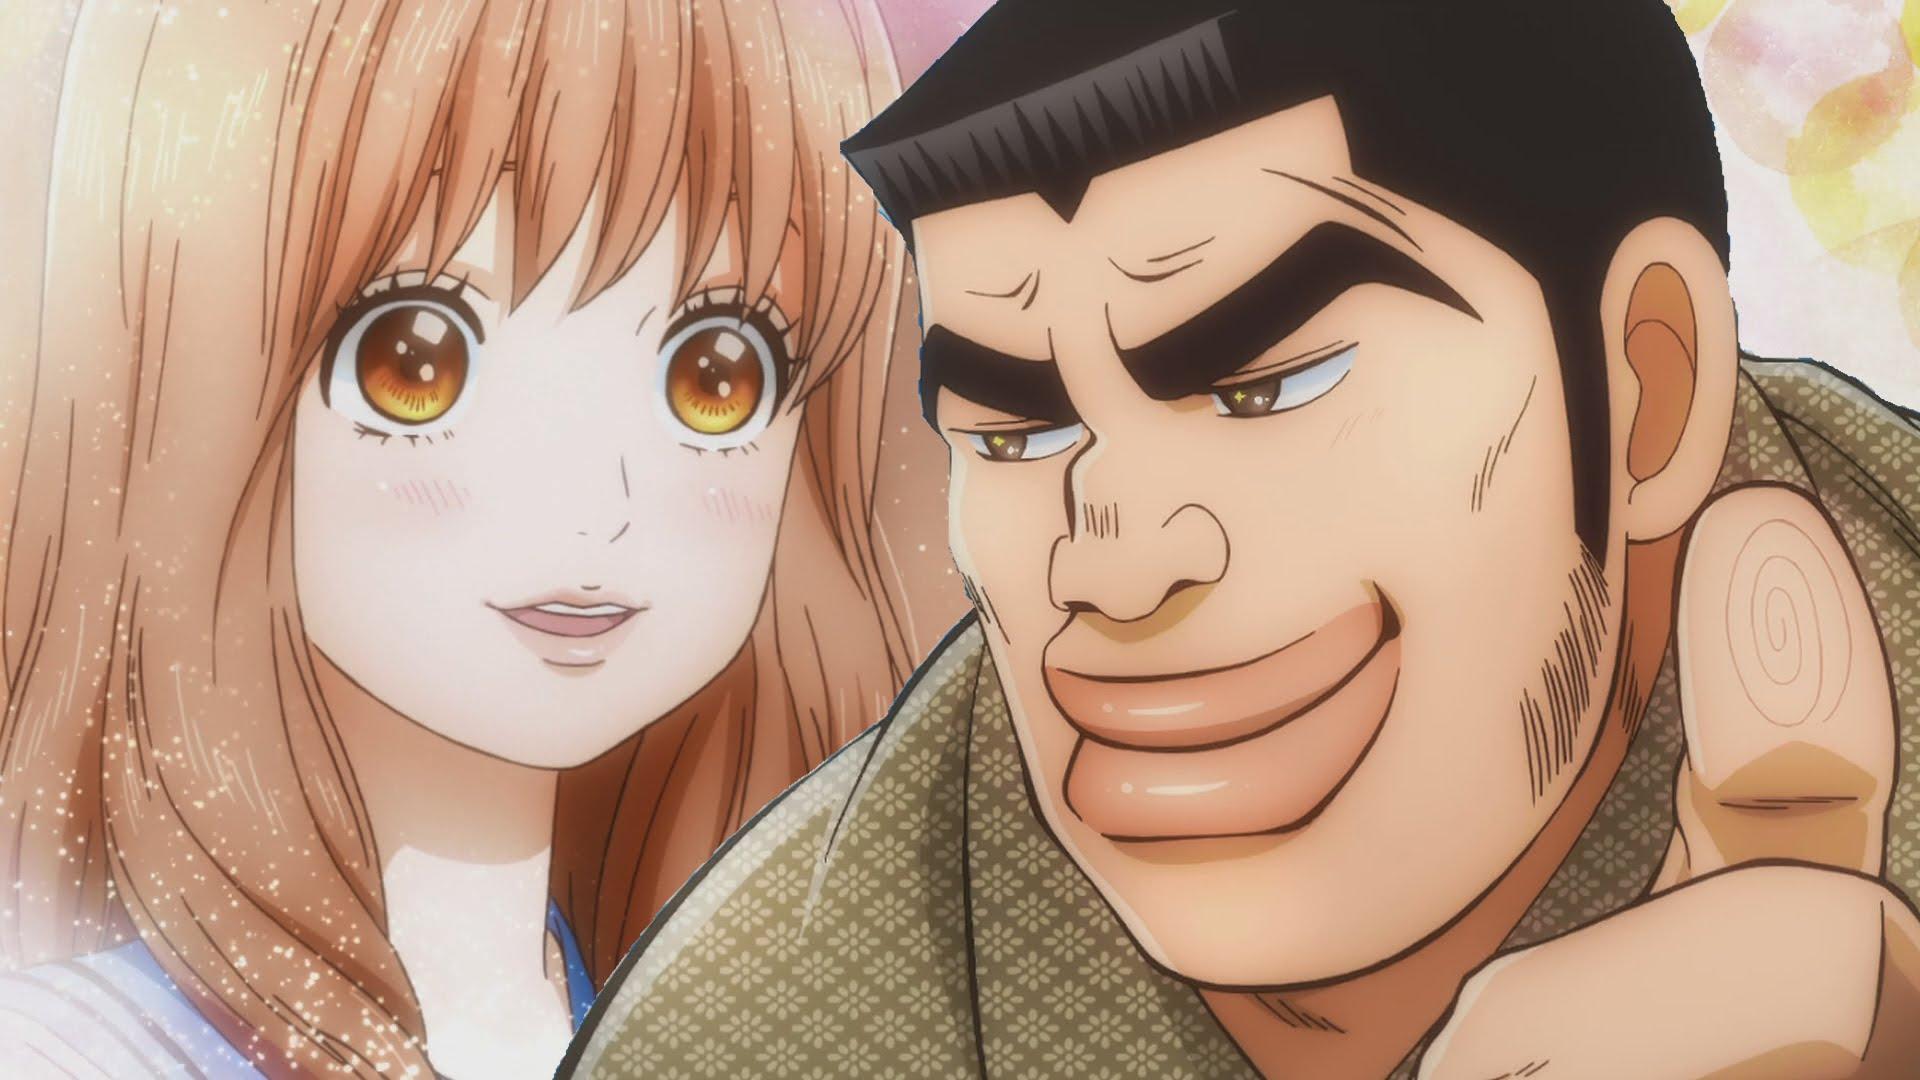 My Love Story Ore Monogatari Images Yamato And Her Beloved